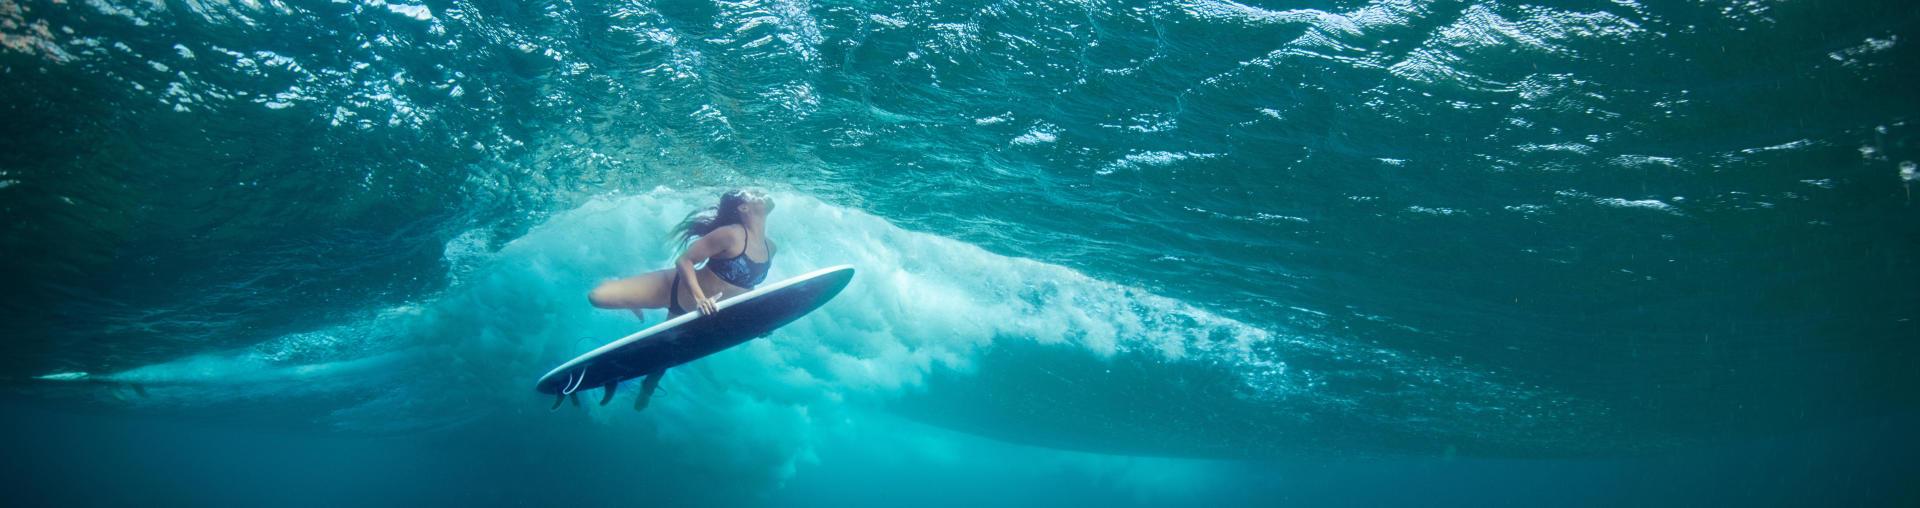 Loja de Surf Decathlon